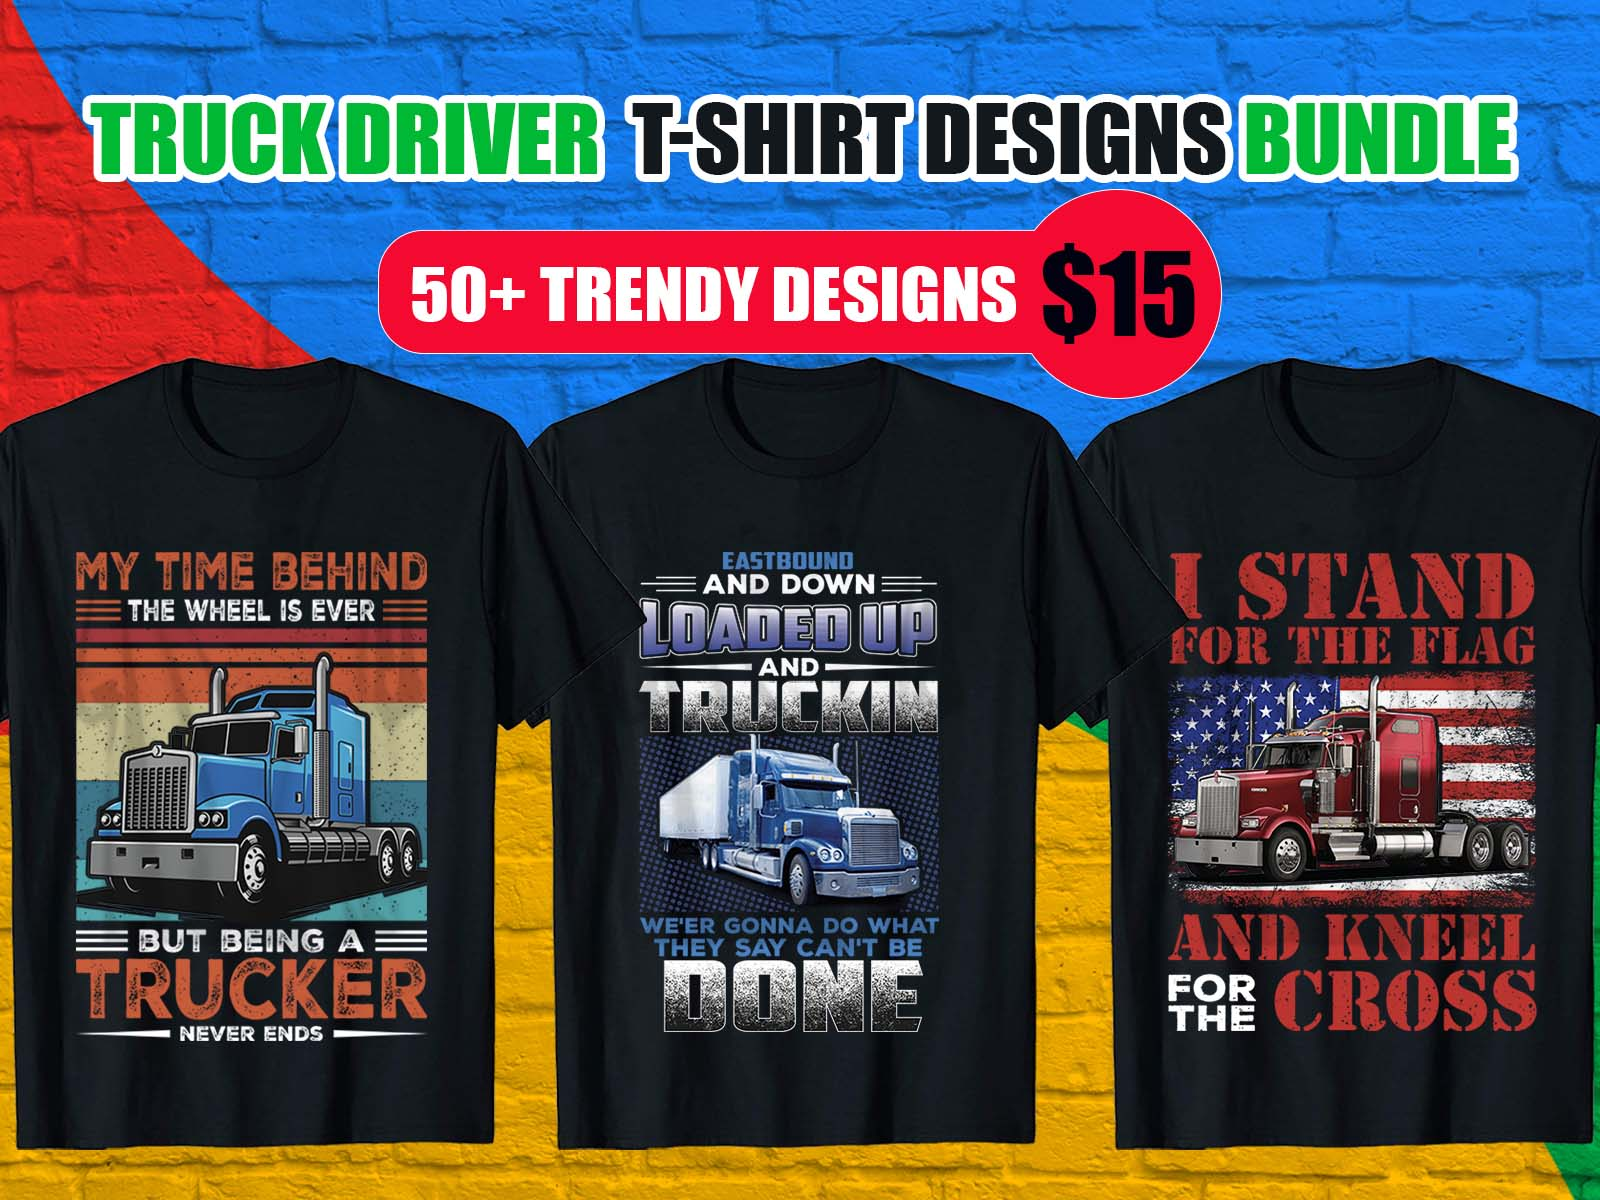 Truck Driver T-Shirt Design Bundle